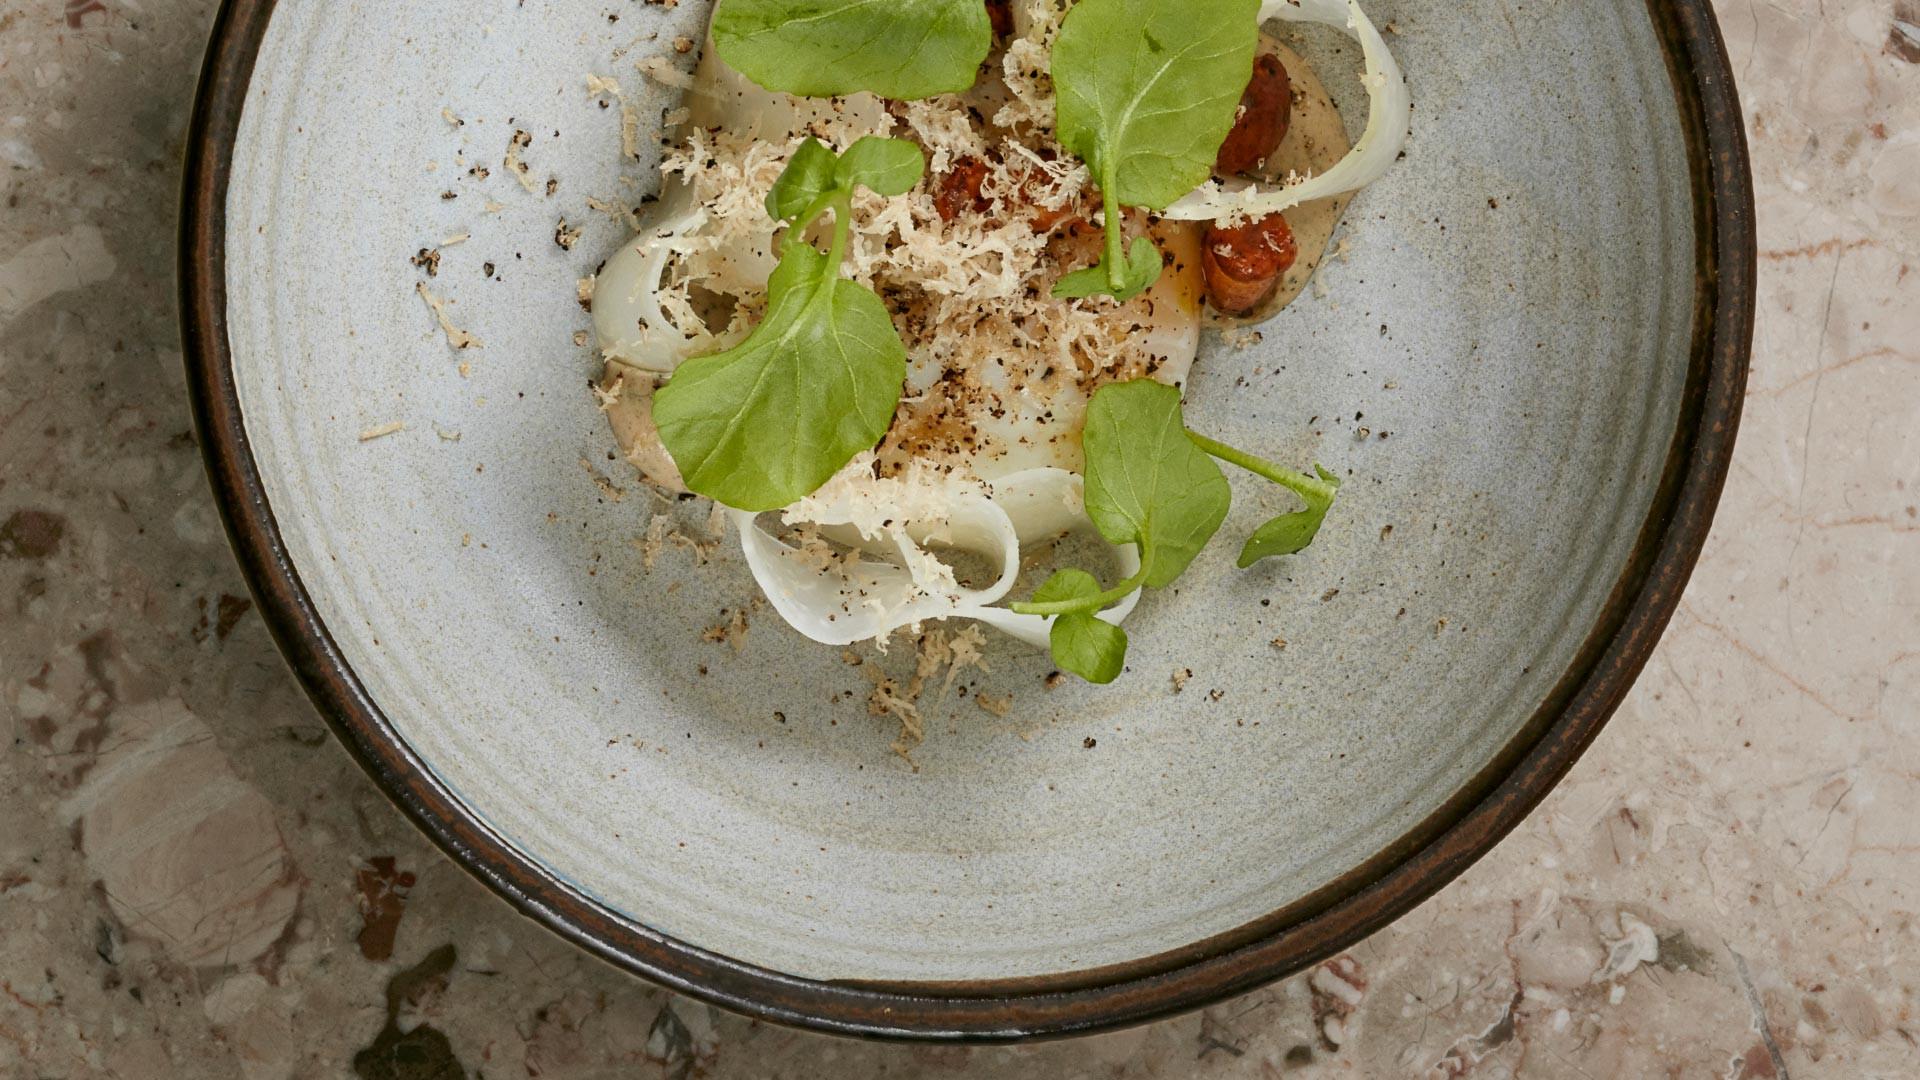 Pheasant egg, kohlrabi, girolles and truffle